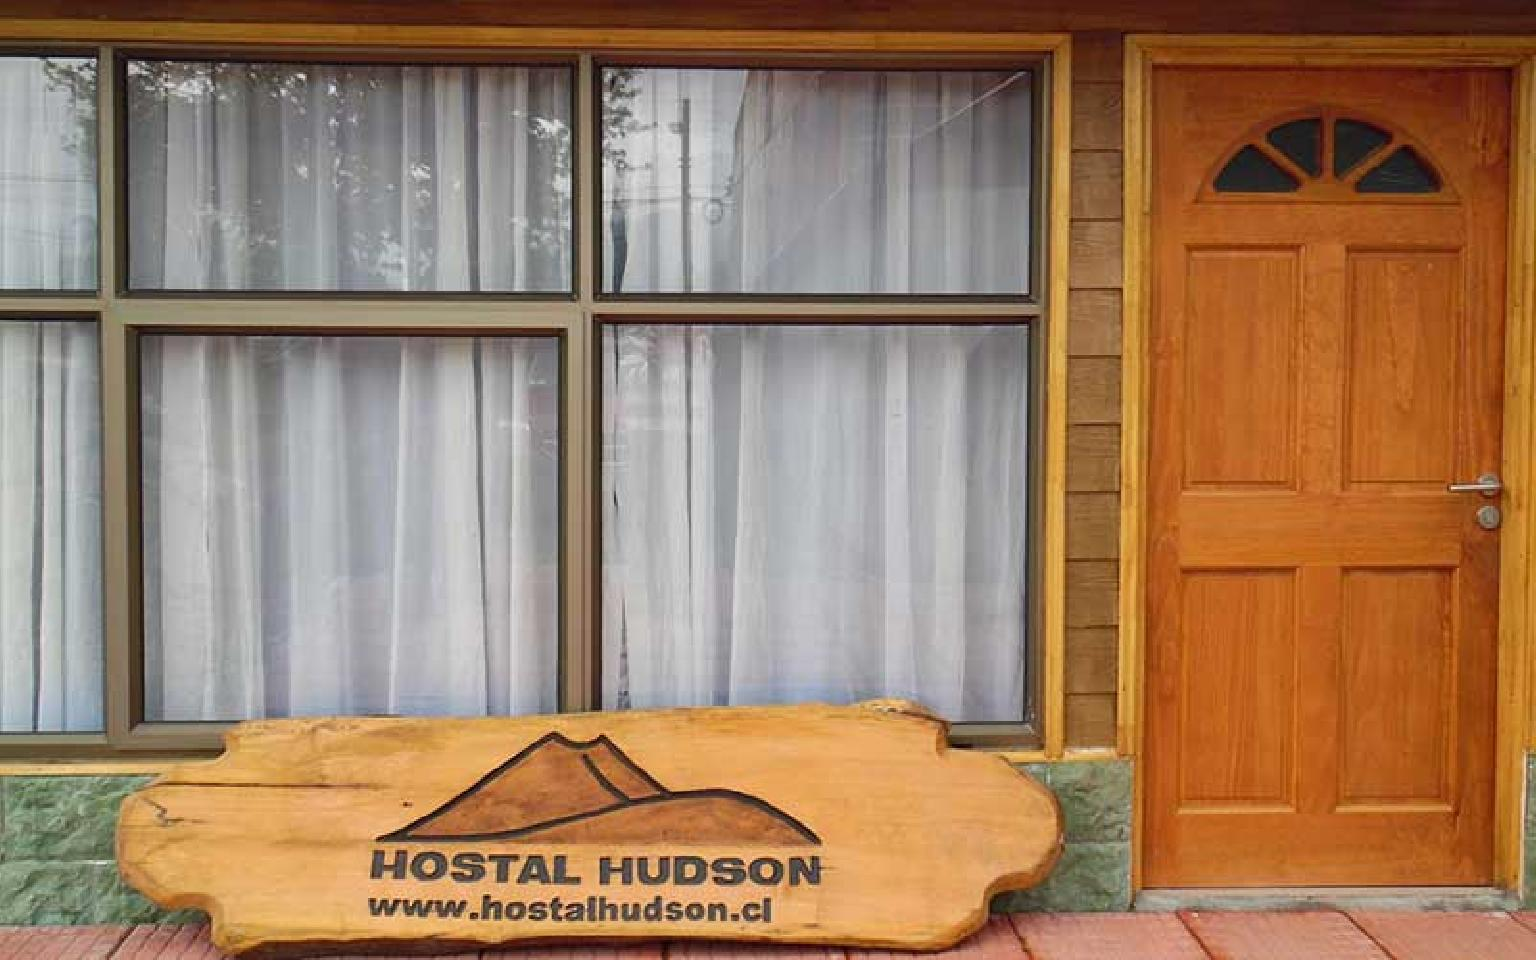 Hostal Hudson